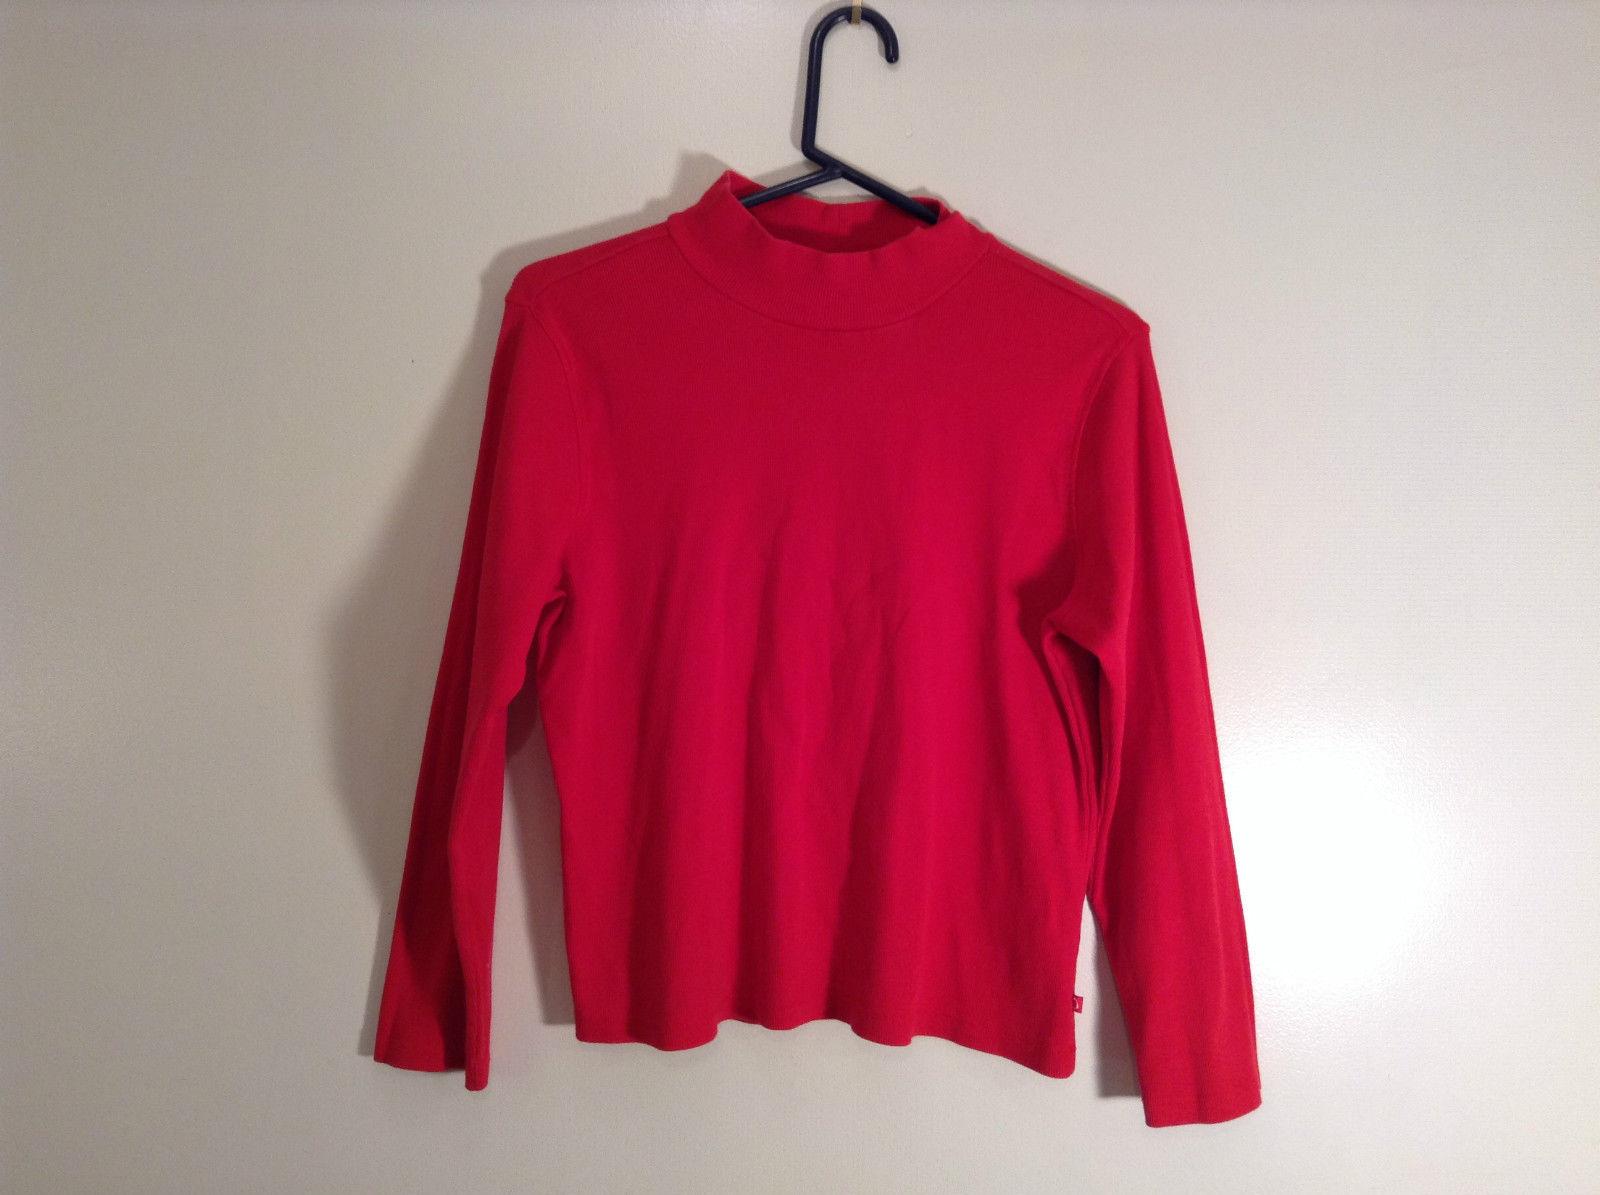 Red Mock Turtleneck Top Liz Claiborne Petite Size M Petite Long Sleeves